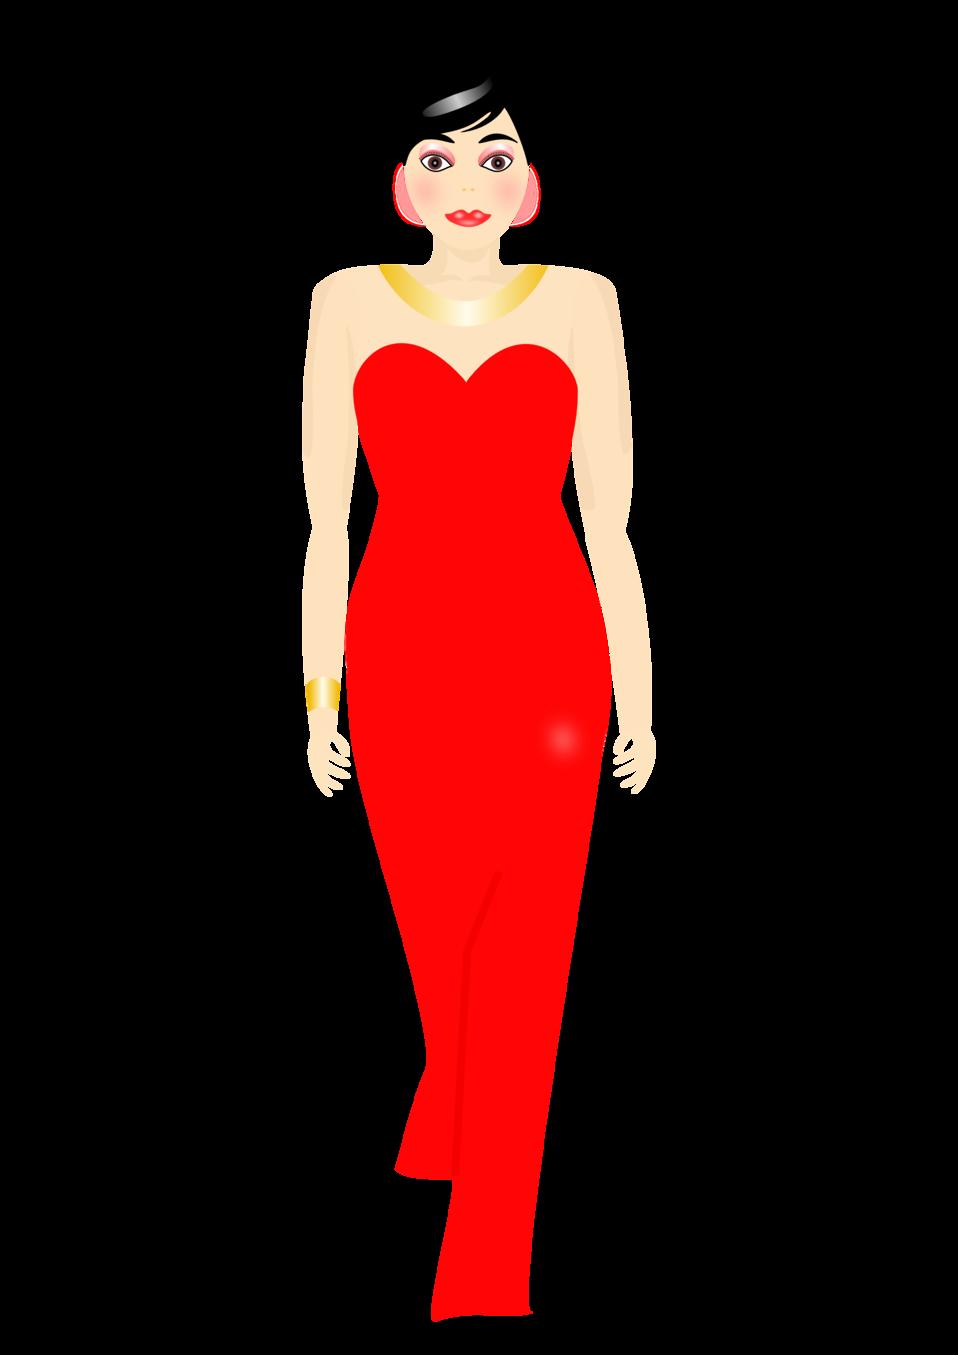 Fashion clipart model. Public domain clip art